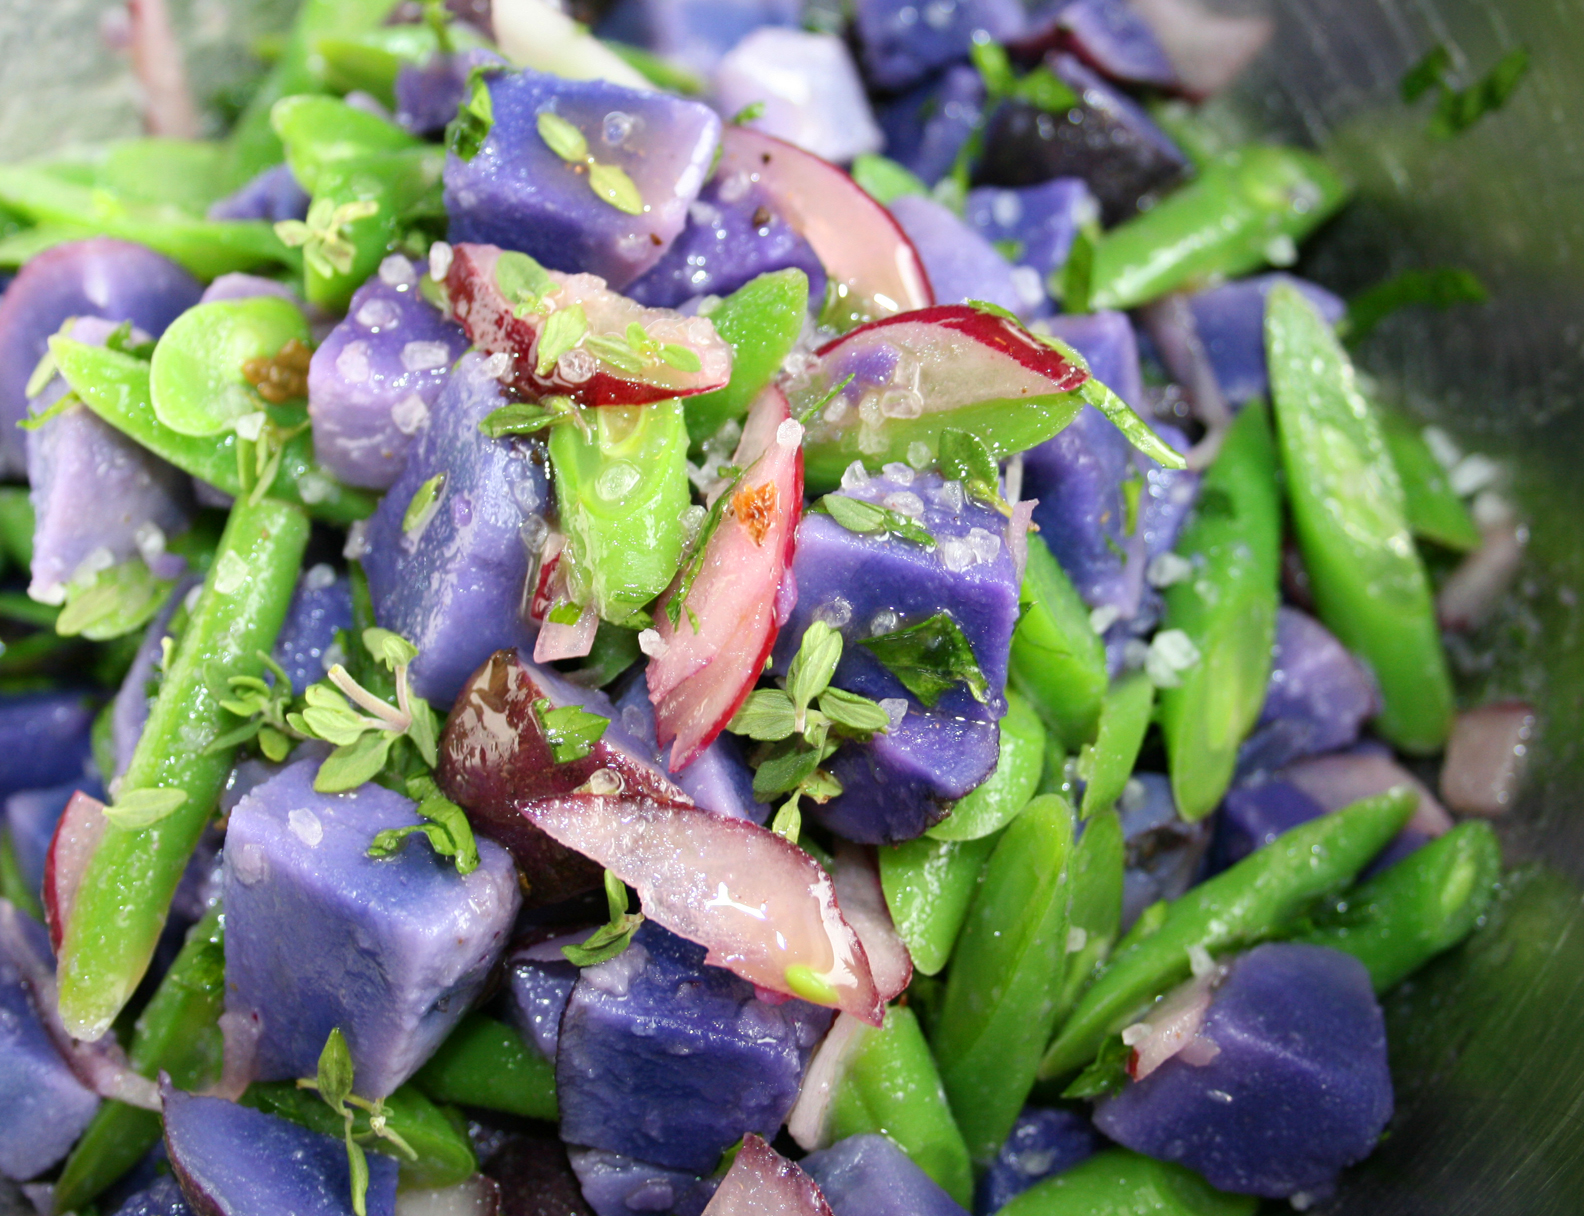 ... prep kit green bean and purple potato salad green beans purple potato